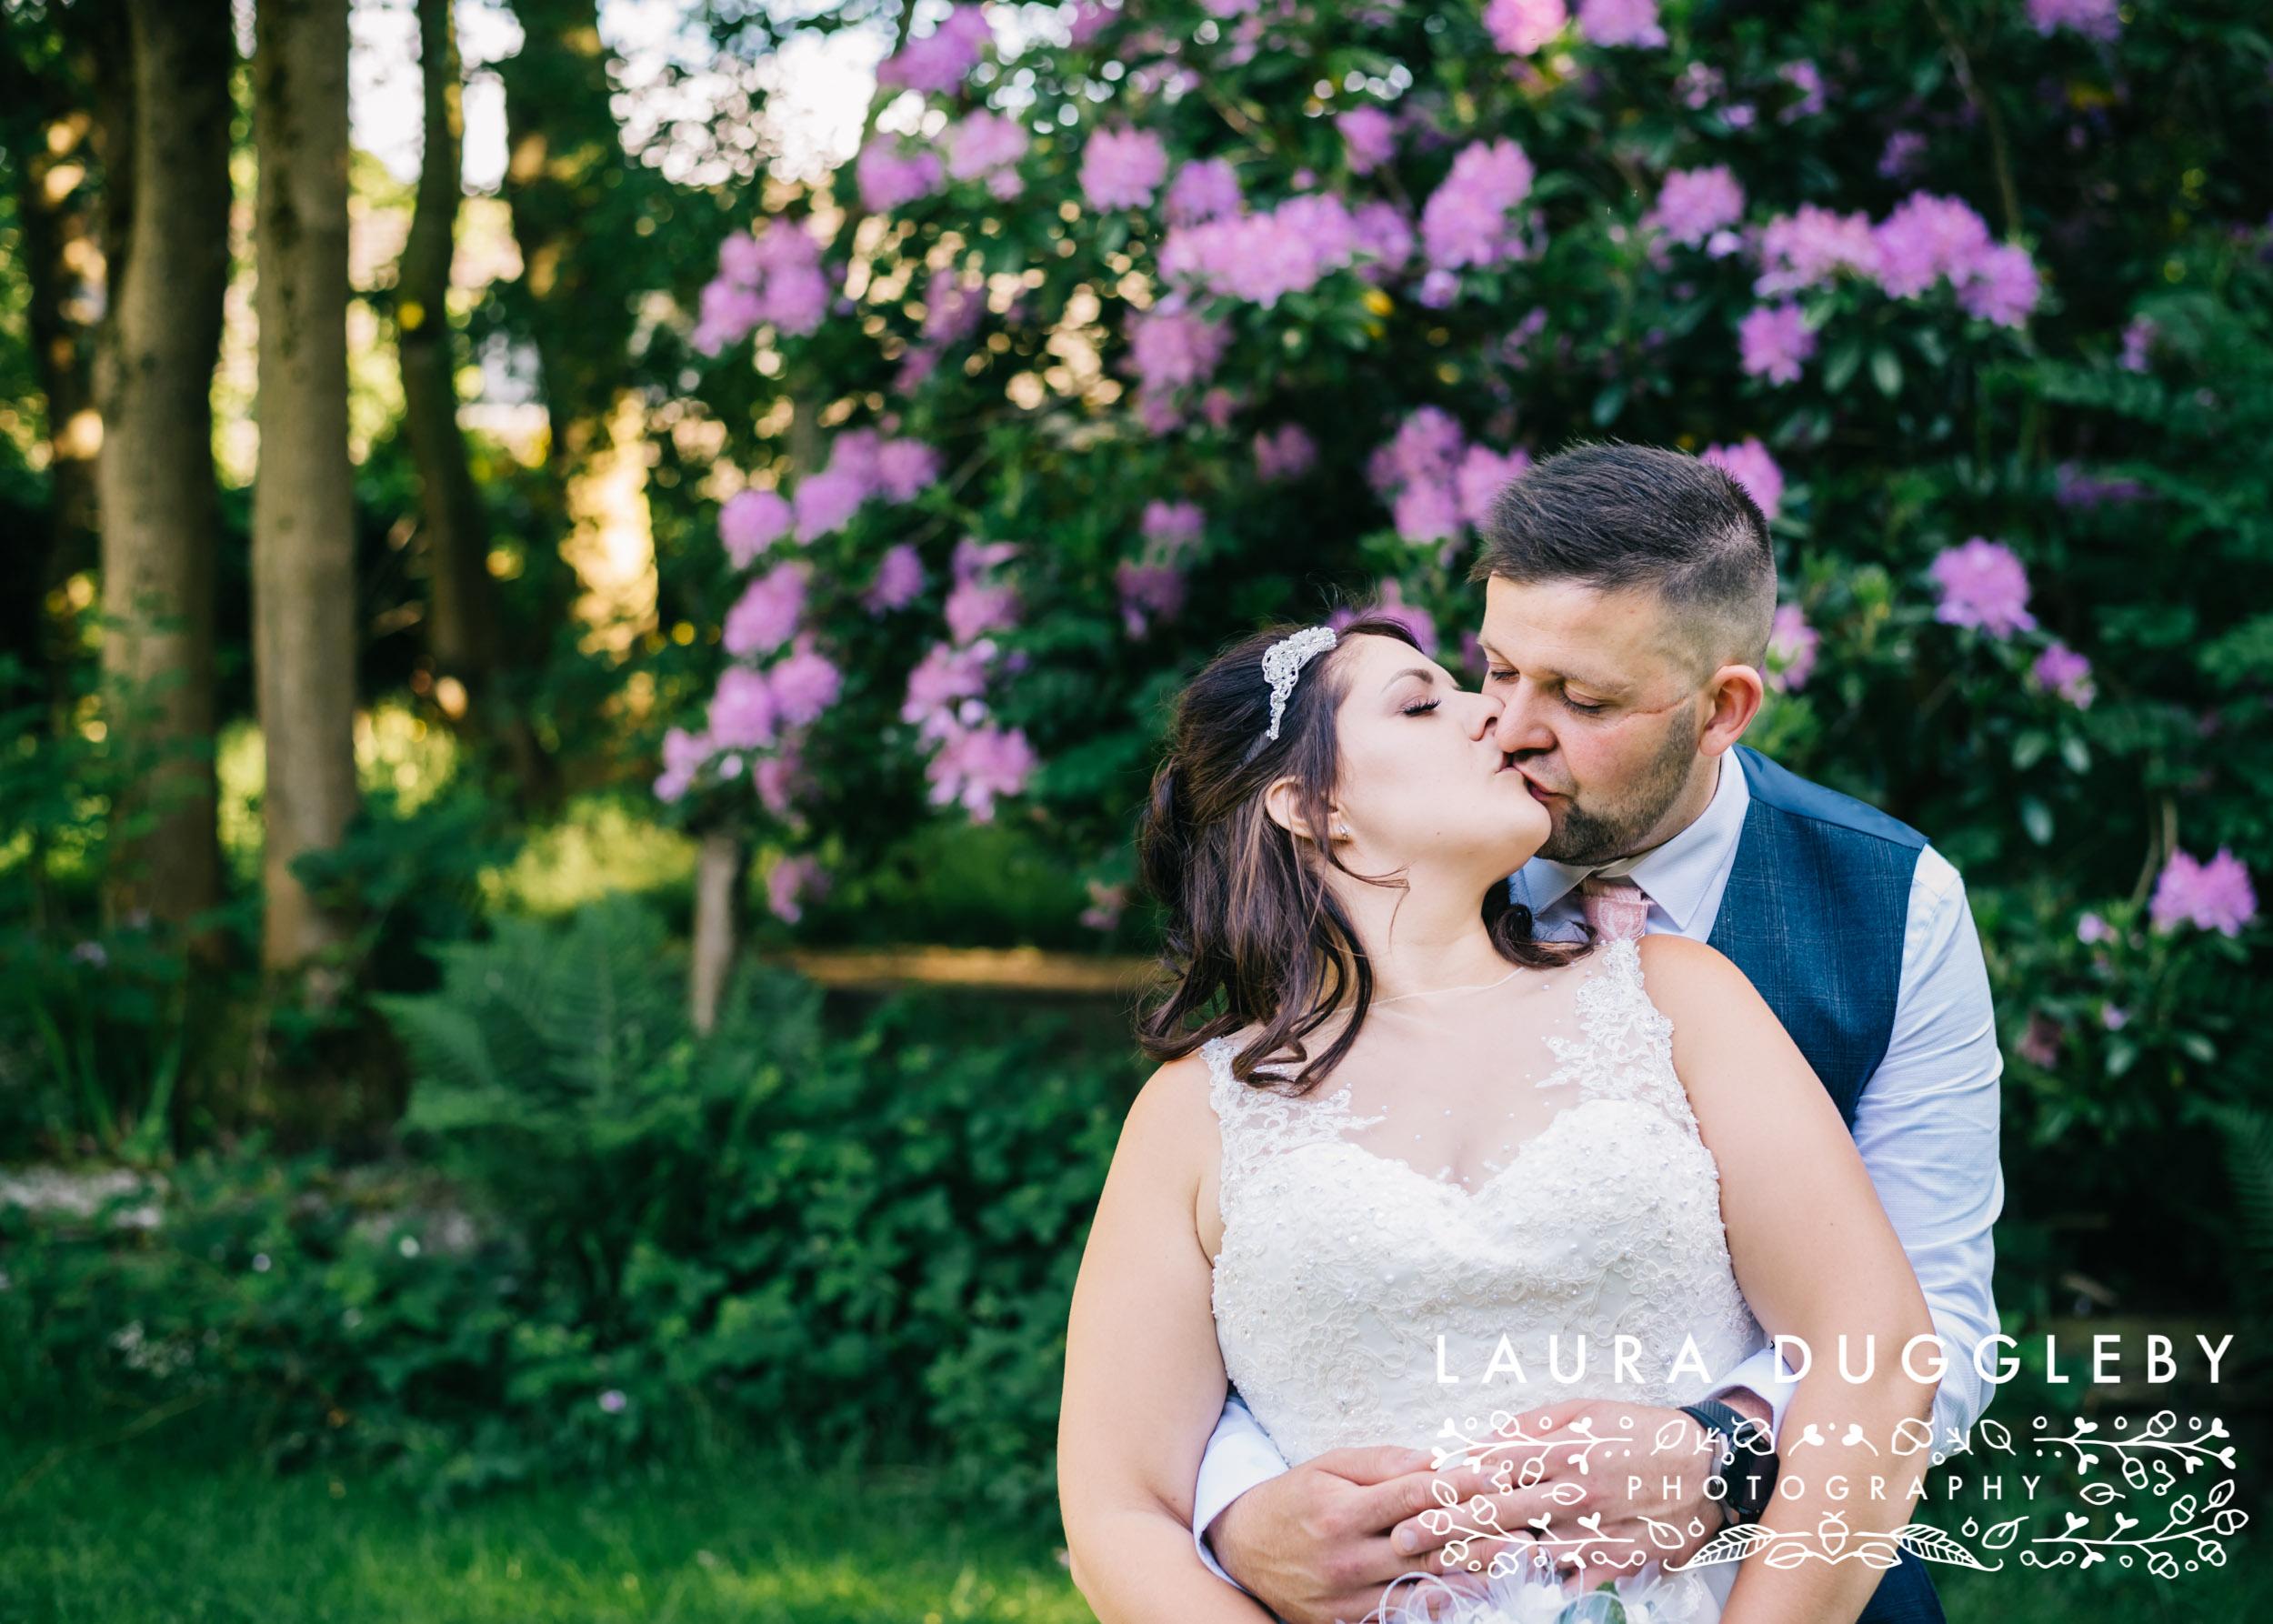 Sparth House Wedding - Lancashire Wedding Photographer10